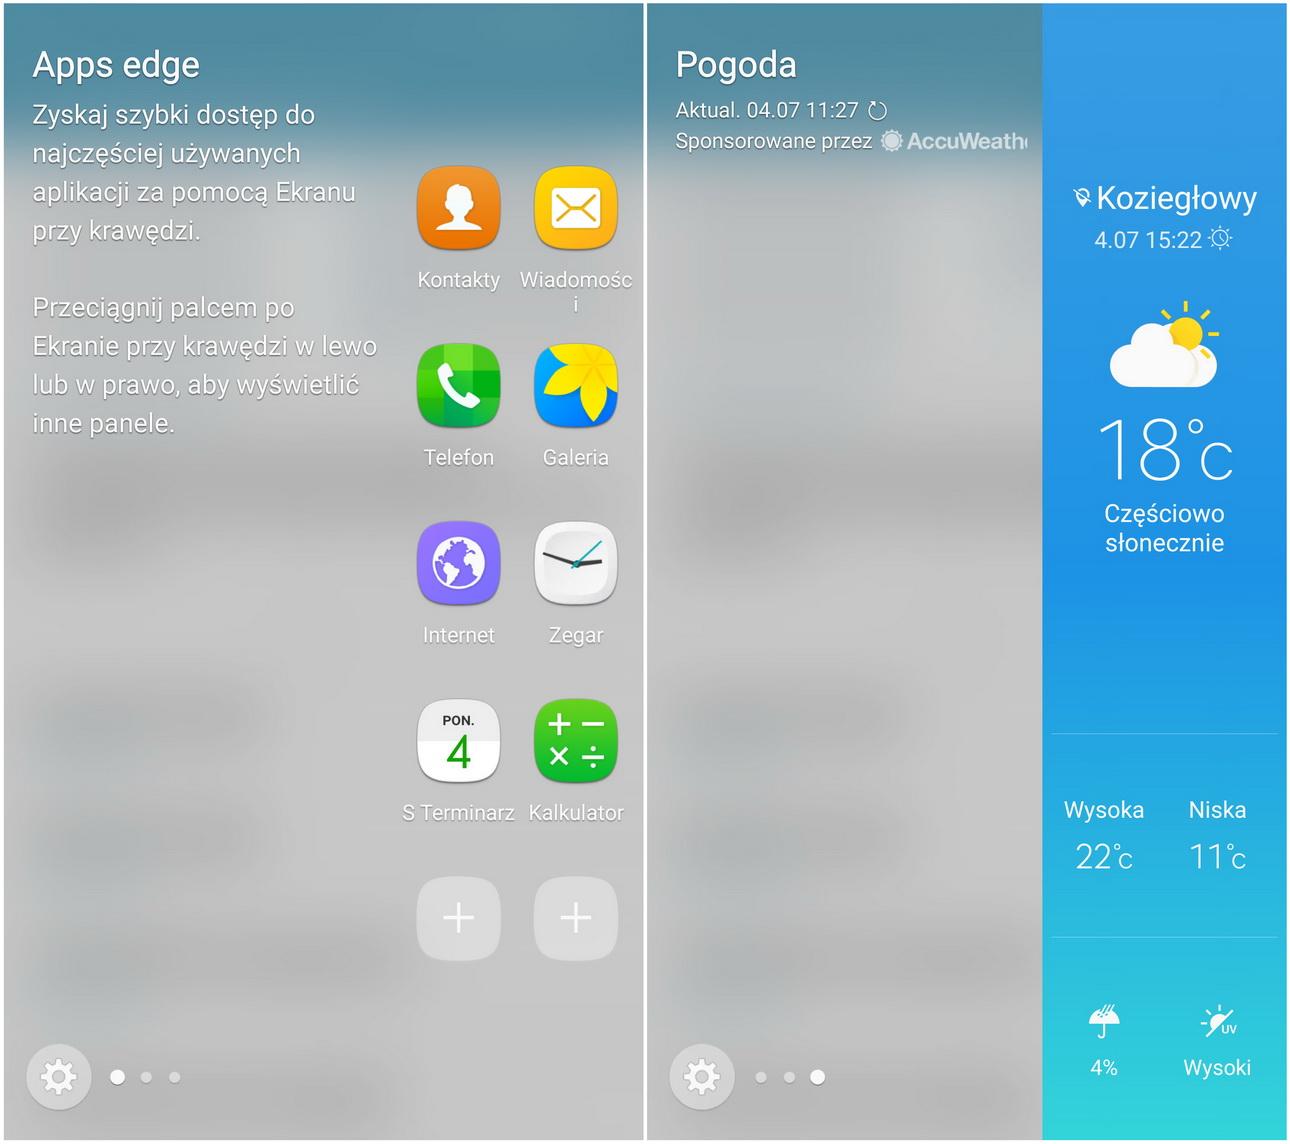 Samsung Galaxy S7 (SM-G935) - recenzja 90sekund.pl